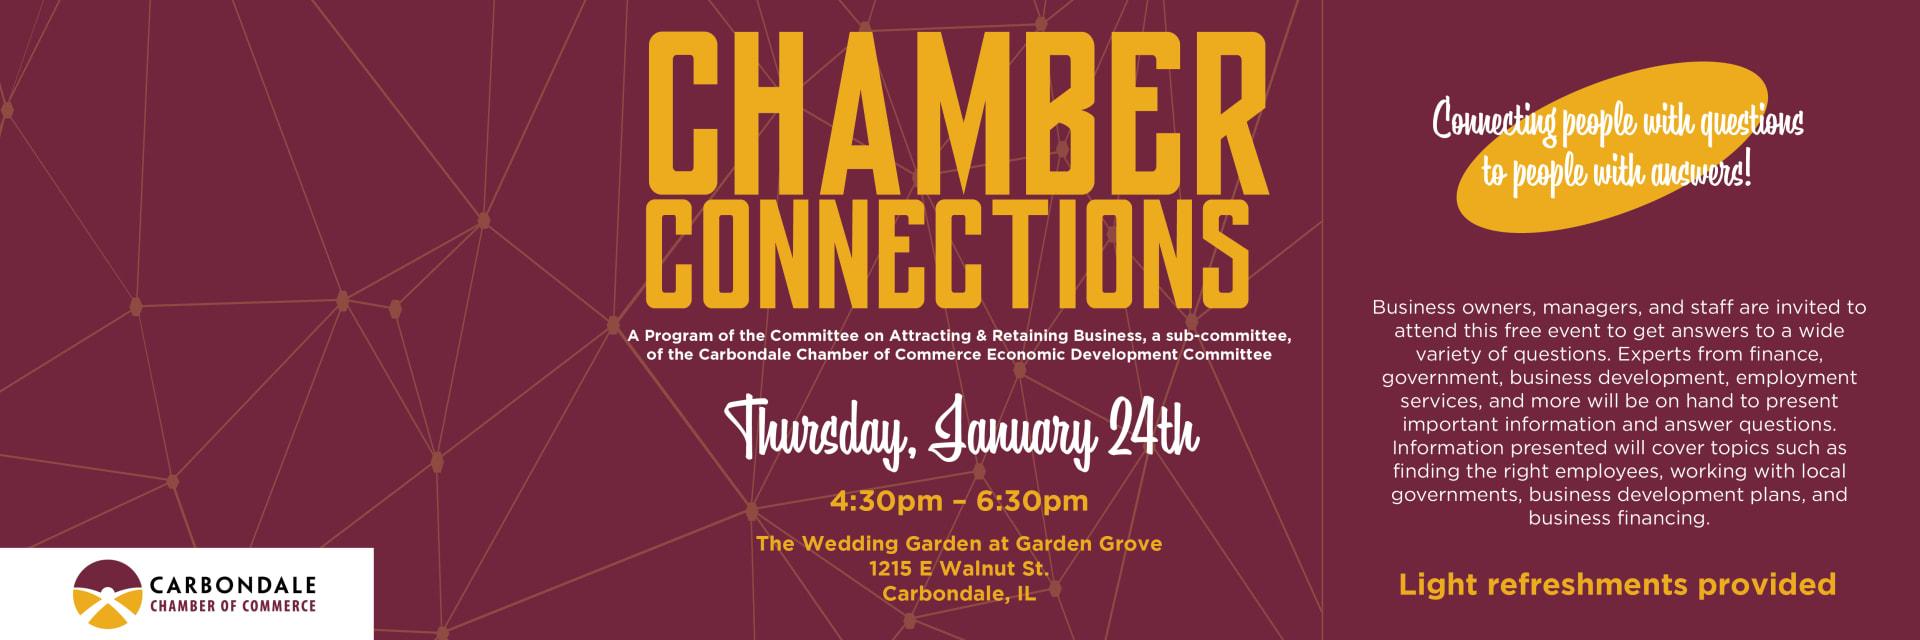 Chamber-Connection_Slider-01-w1920.jpg